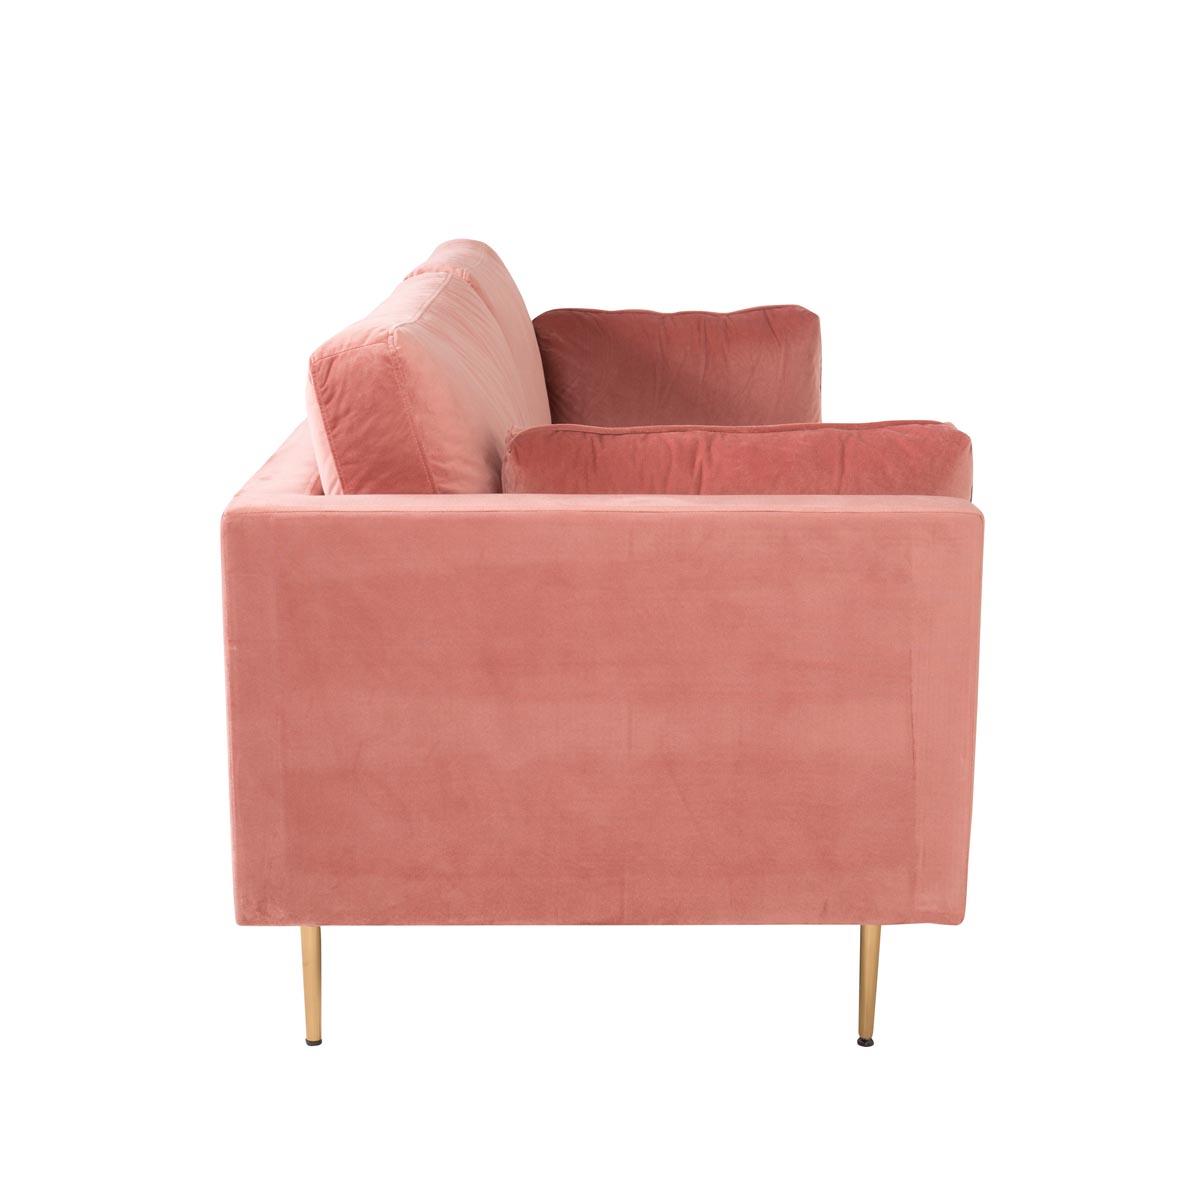 Boom-3-sits-soffa-rosa-sammet-sida-18045-989